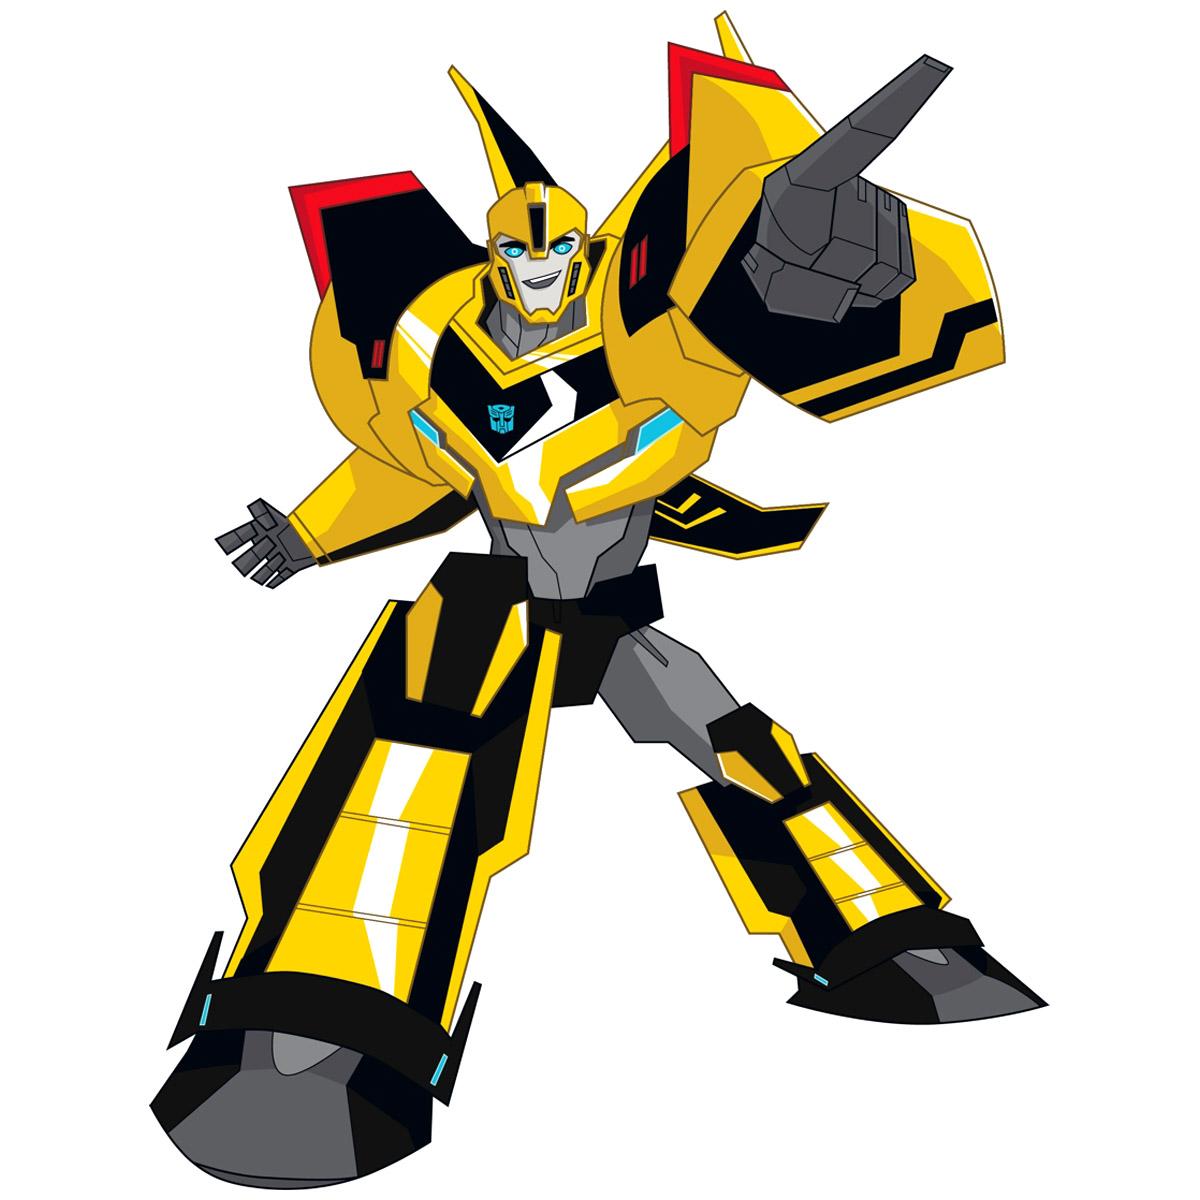 Mewarnai Gambar Transformer %